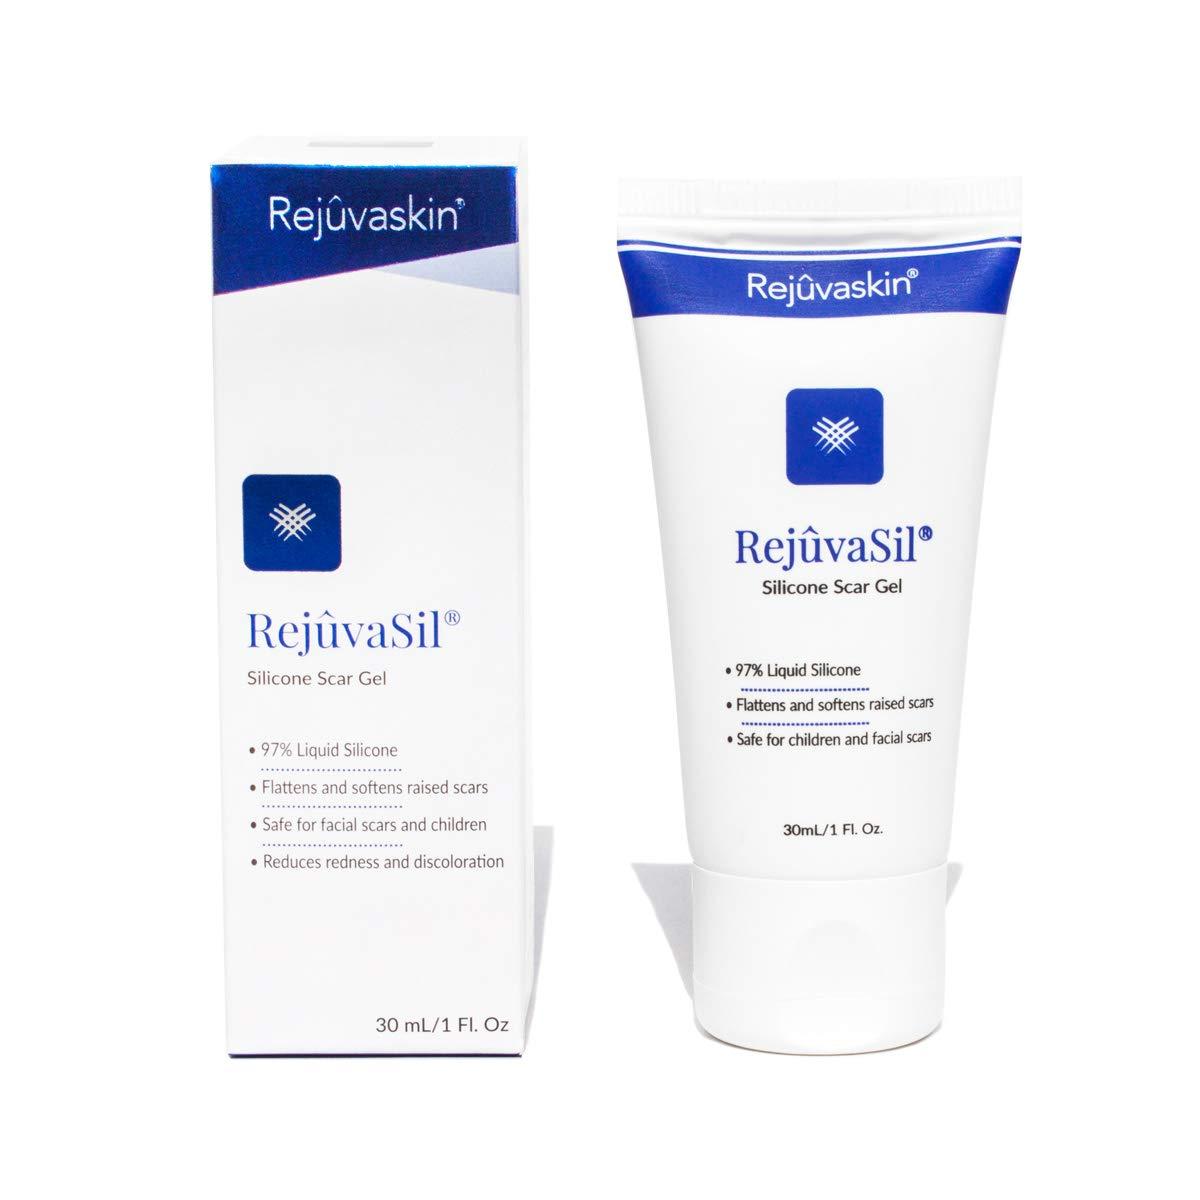 Rejuvaskin RejuvaSil Silicone Scar Gel - Improves the Appearance of Scars - Physician Recommended - 30 mL by Rejuvaskin